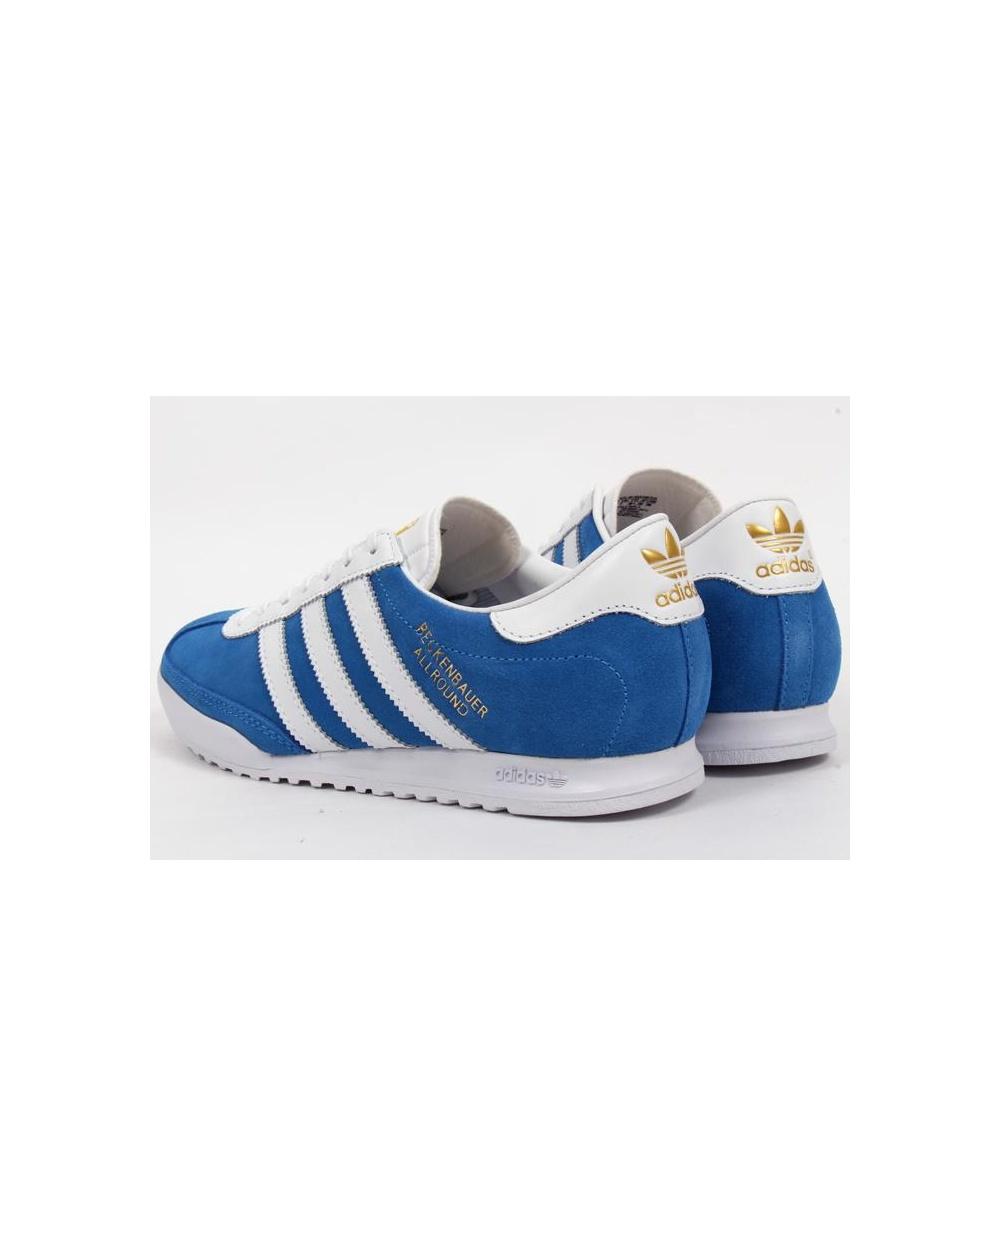 ... Adidas Beckenbauer Trainers Bluebird Bluewhite ... 340c5b396